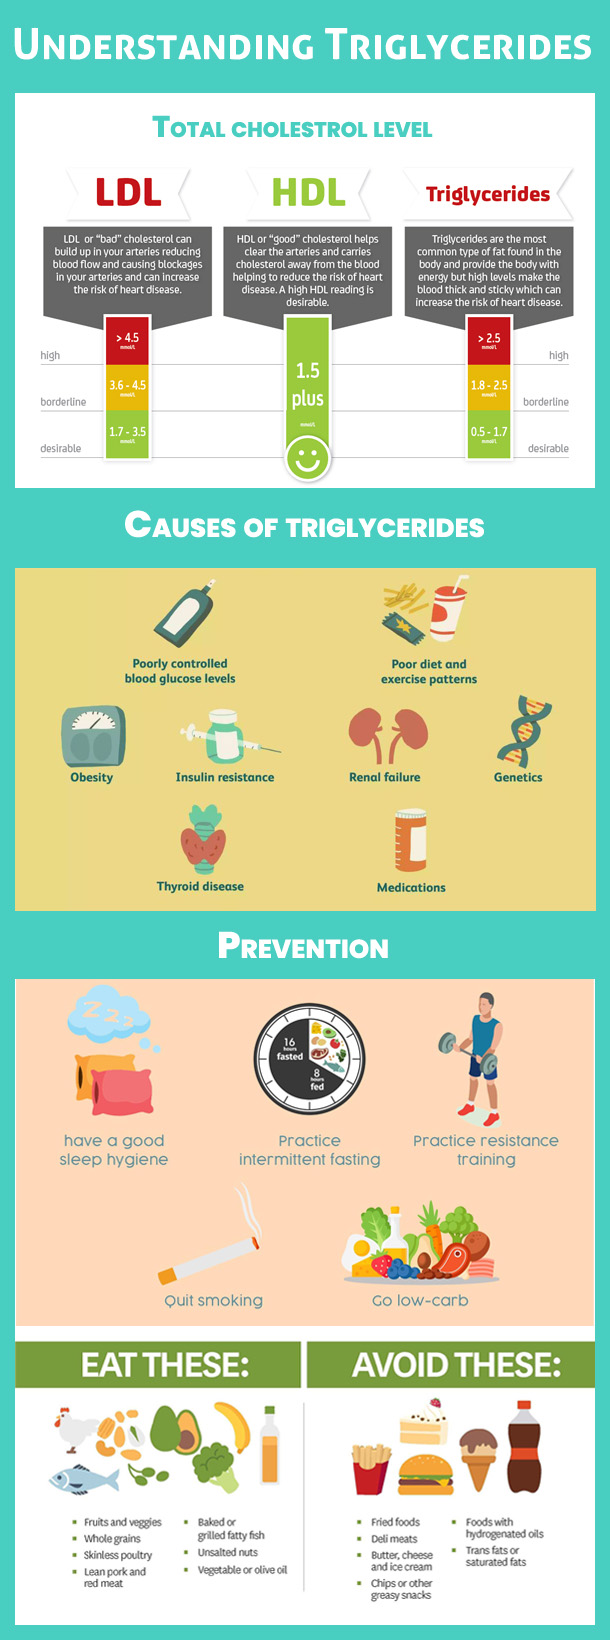 Understanding Triglycerides